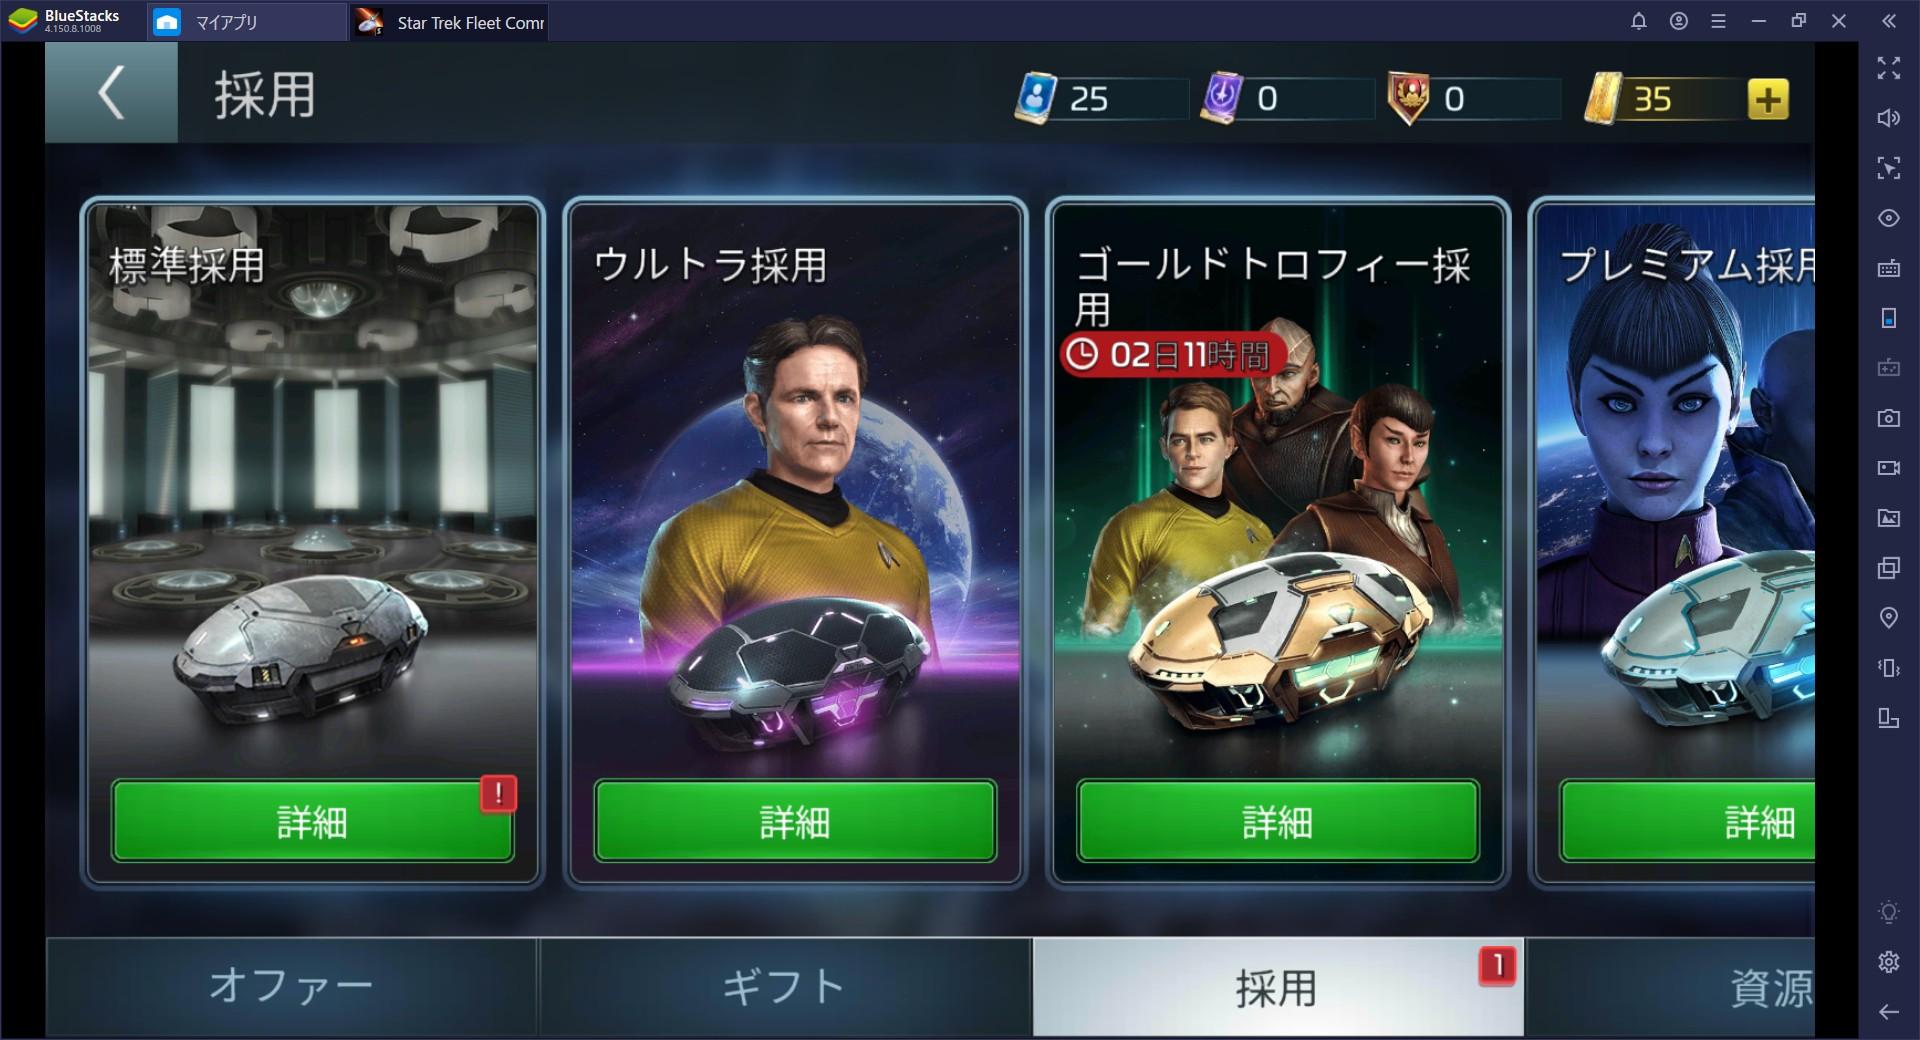 BlueStacksを使ってPCで Star Trek™ Fleet Command を遊ぼう